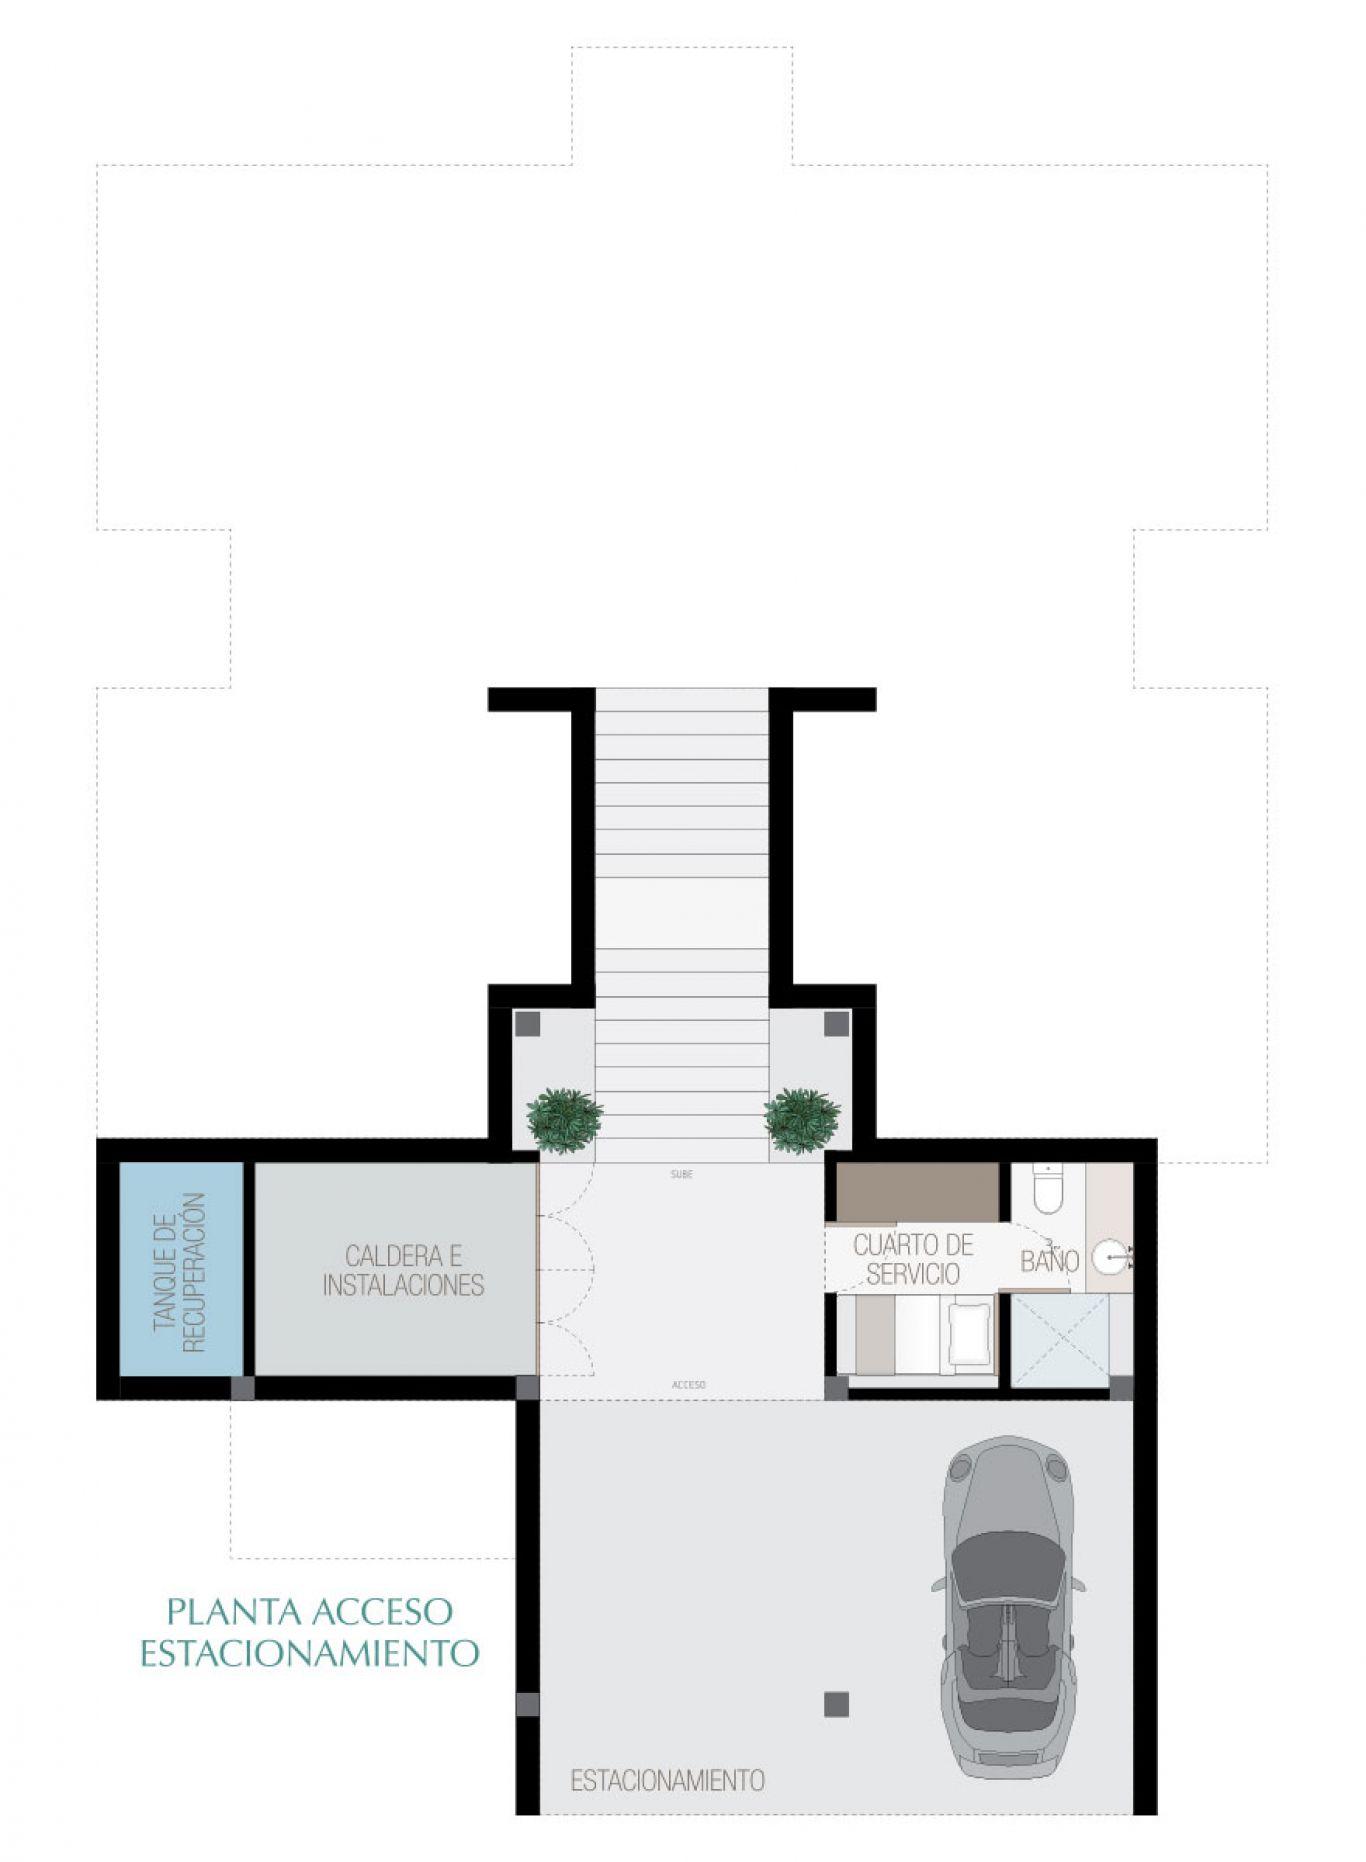 Manai, id 1519068, no 2, plano de villa 5, 294